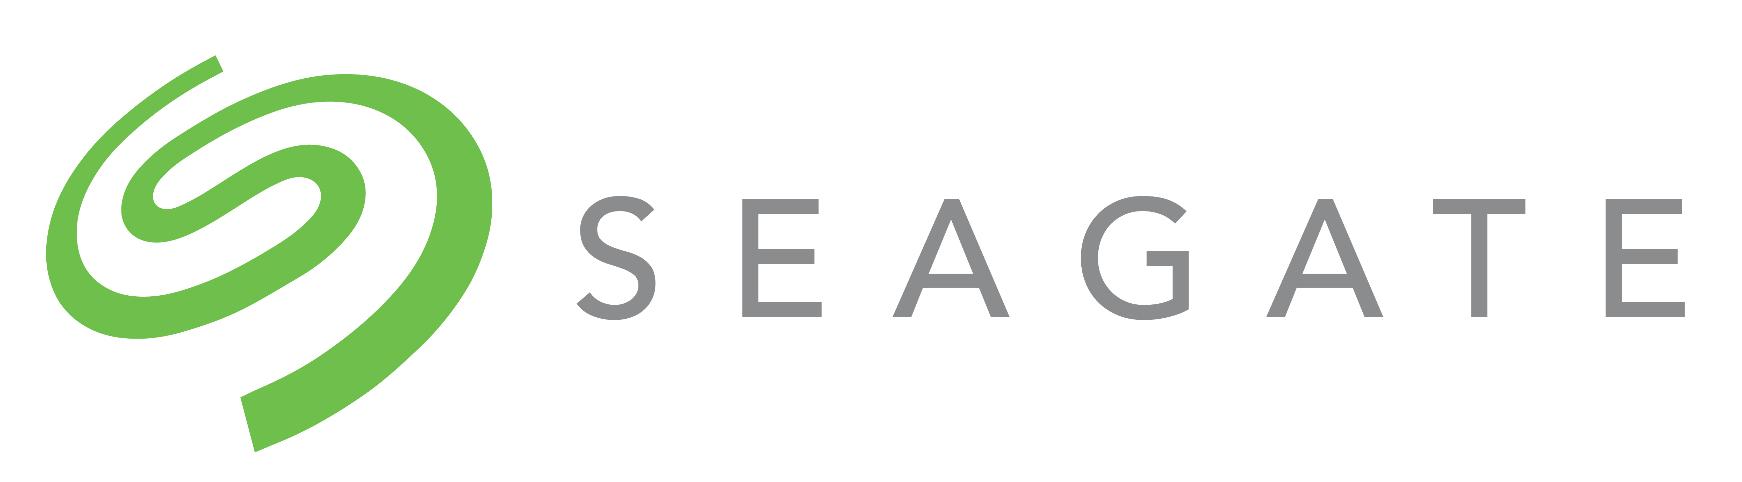 SEAGATE IRONWOLF 125 PRO, 240 GB, 2.5, 545 MB/S,.